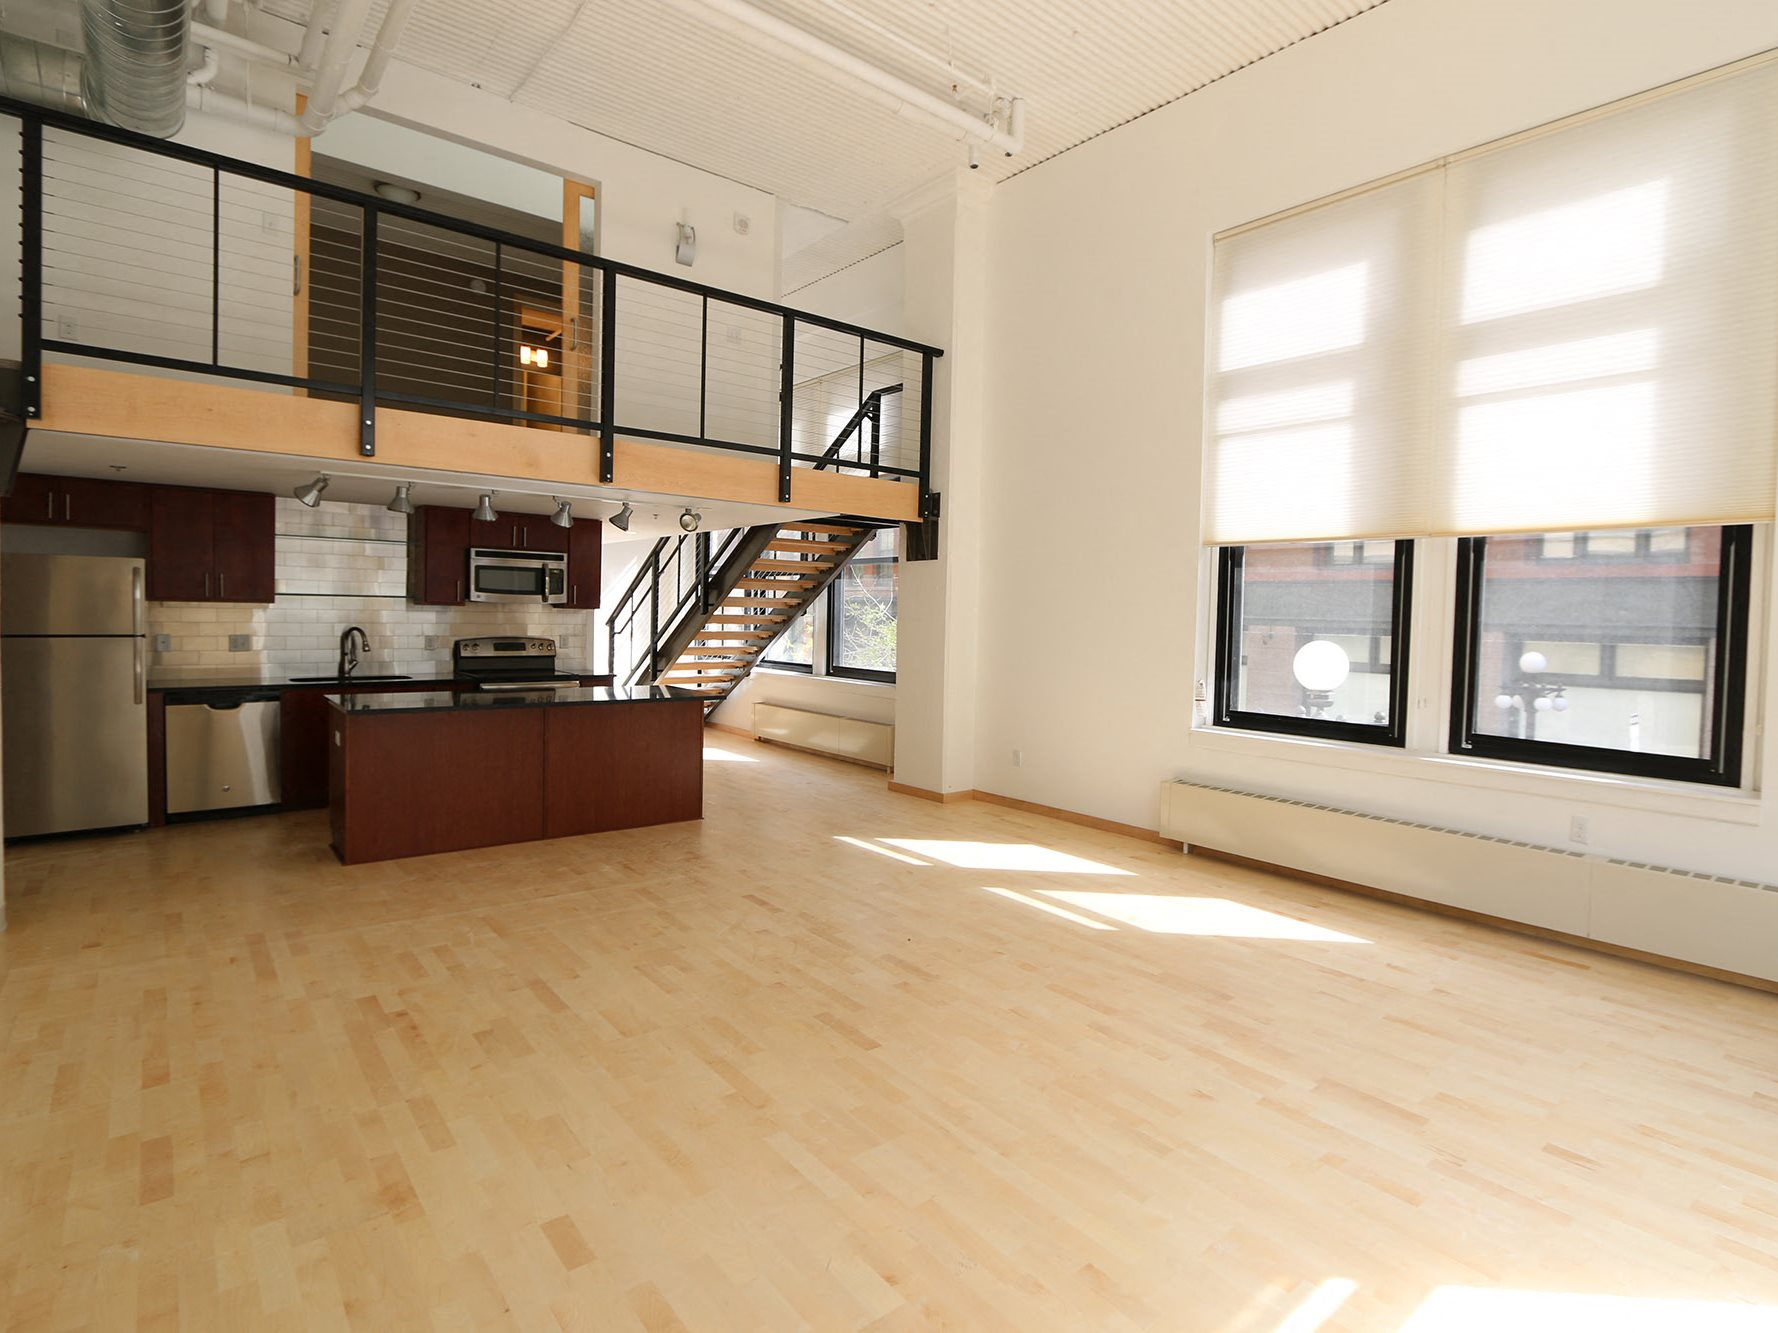 Cosmopolitan Apartments Apartments In Saint Paul Mn